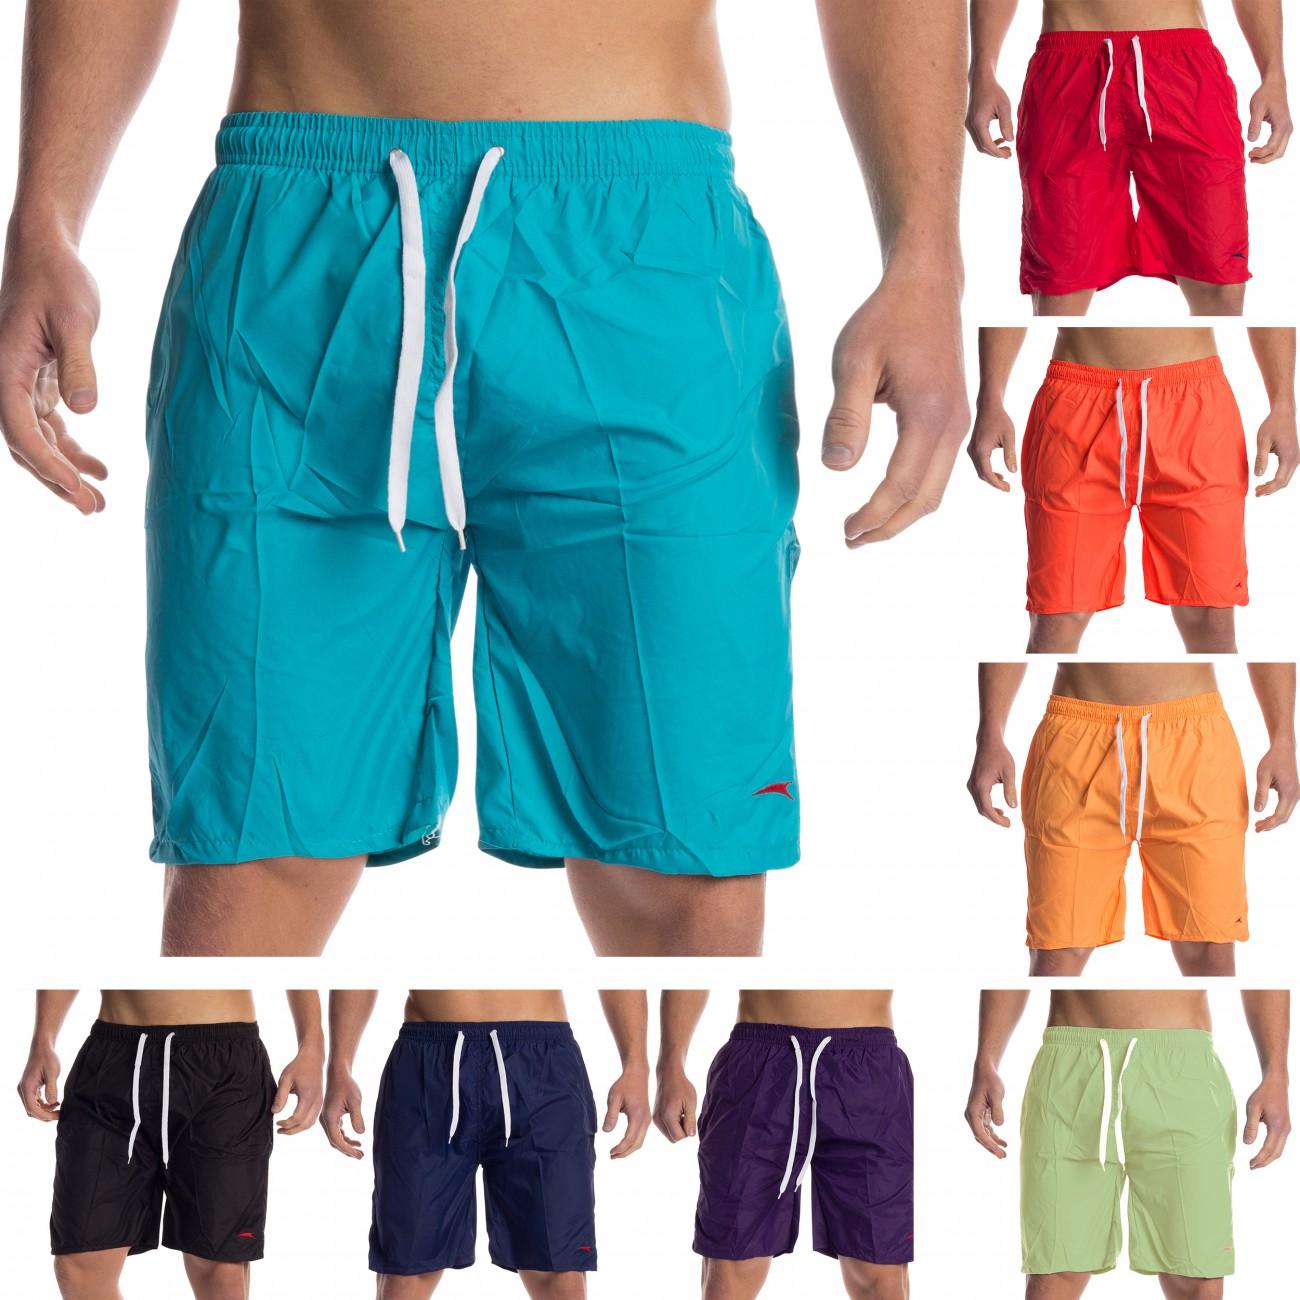 badeshorts herren shorts kurze hose bermuda badehose kurz sommer schwimmhose ebay. Black Bedroom Furniture Sets. Home Design Ideas